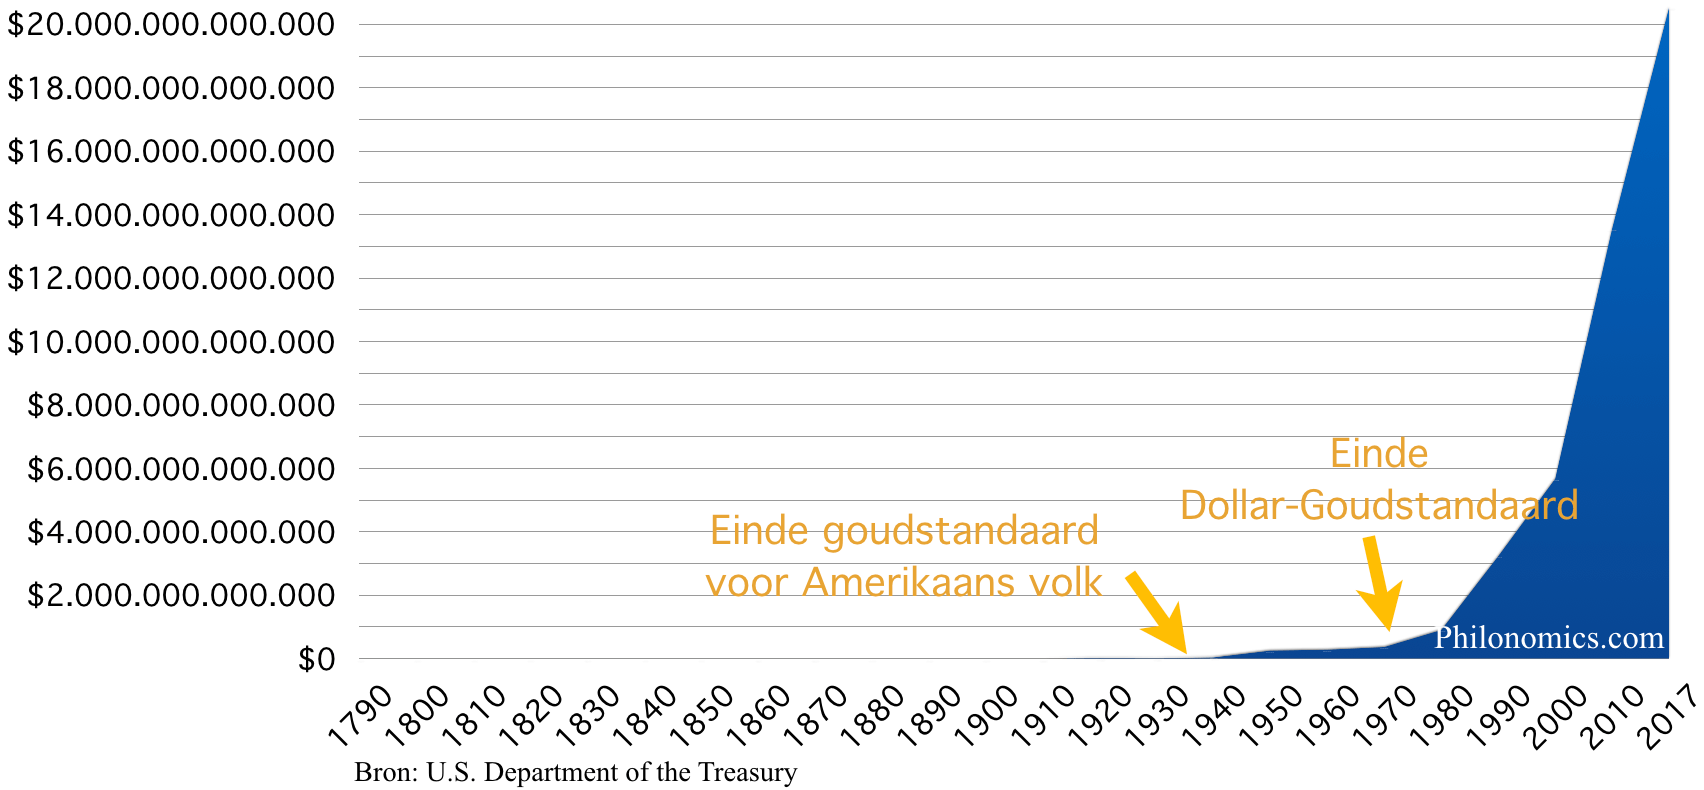 Staatsschuld Verenigde Staten 1790-2017